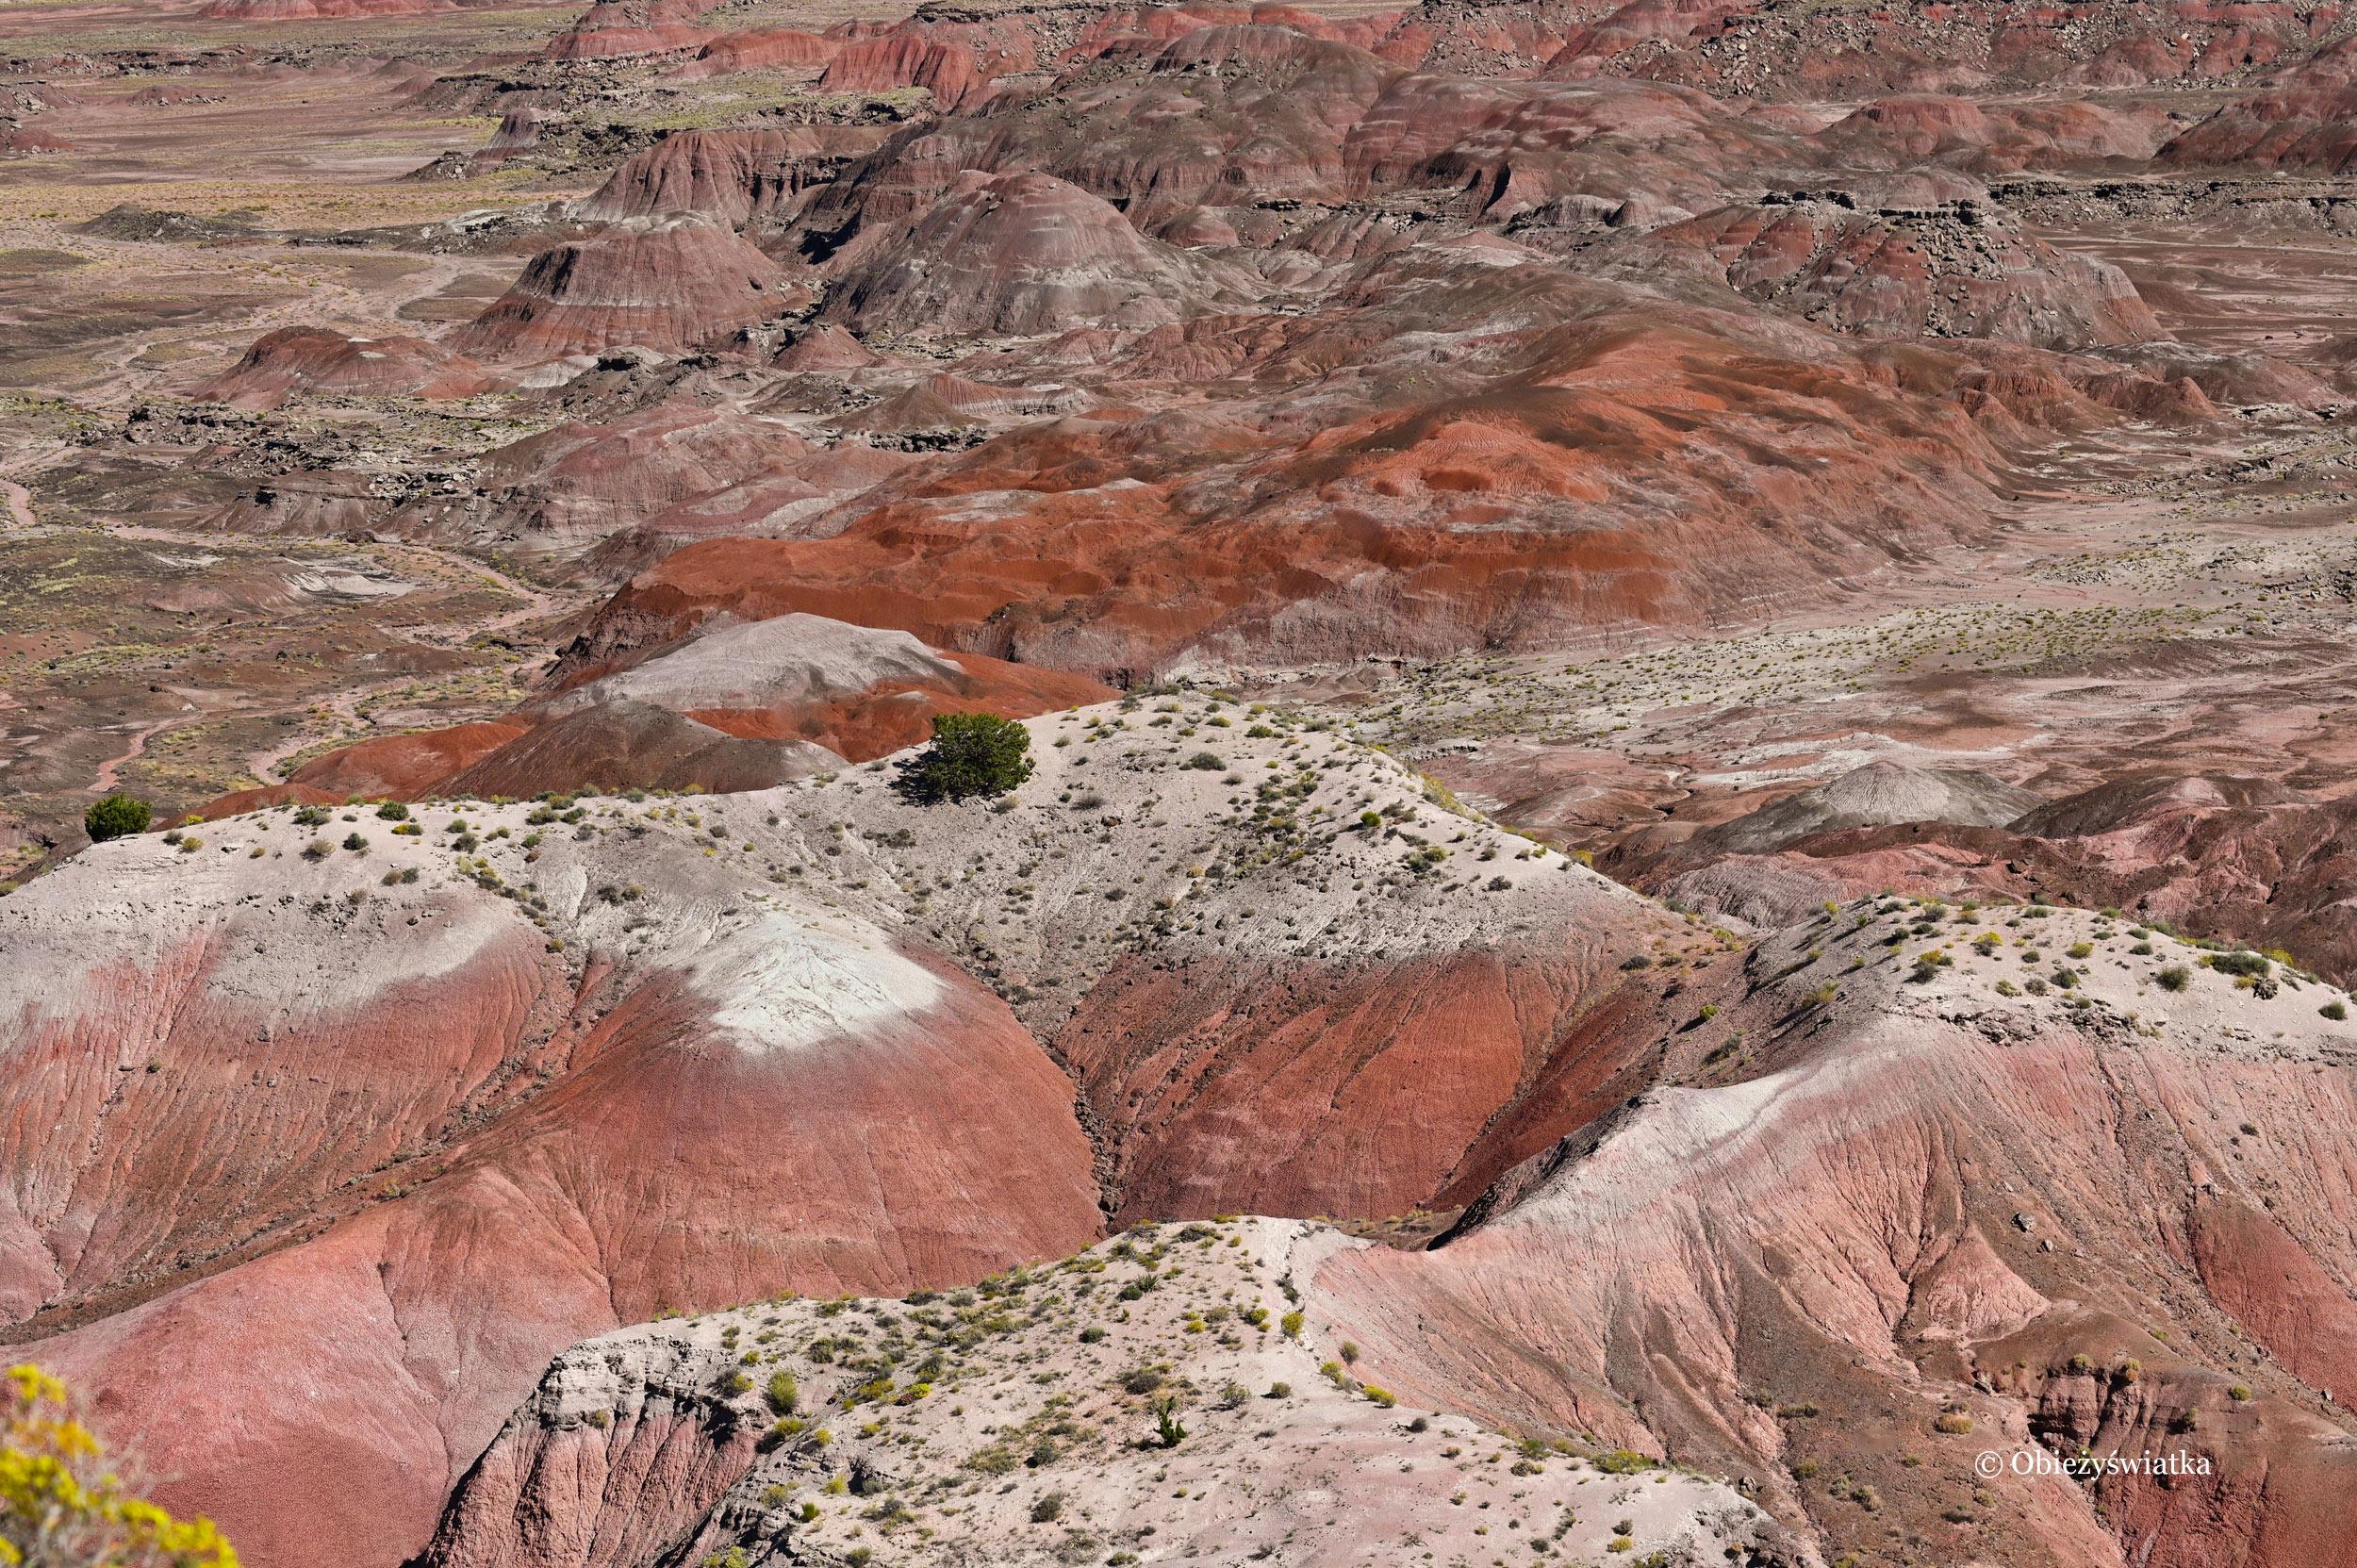 Kolorowo - Painted Desert, Arizona